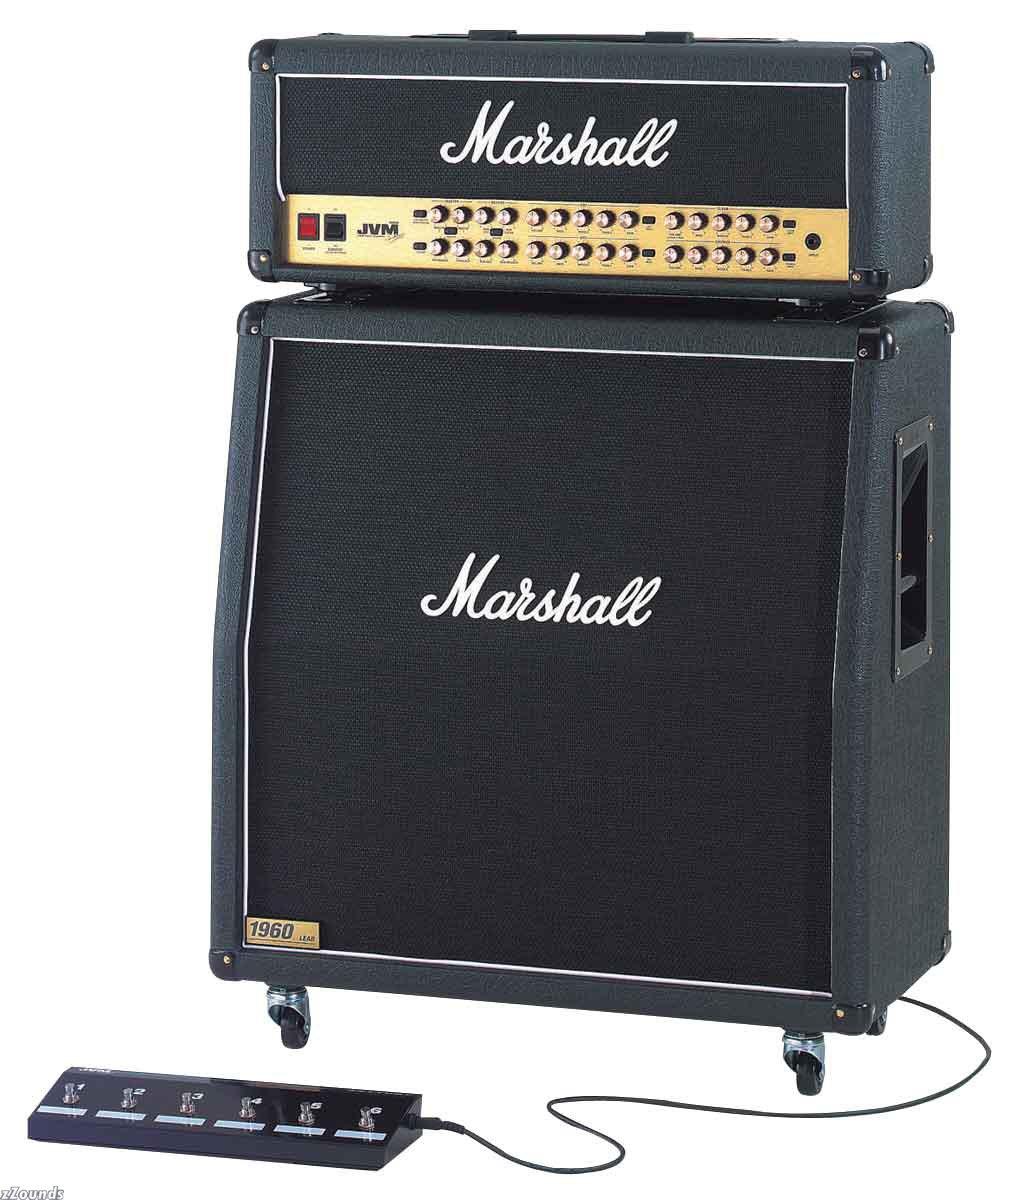 Dating my marshall amp